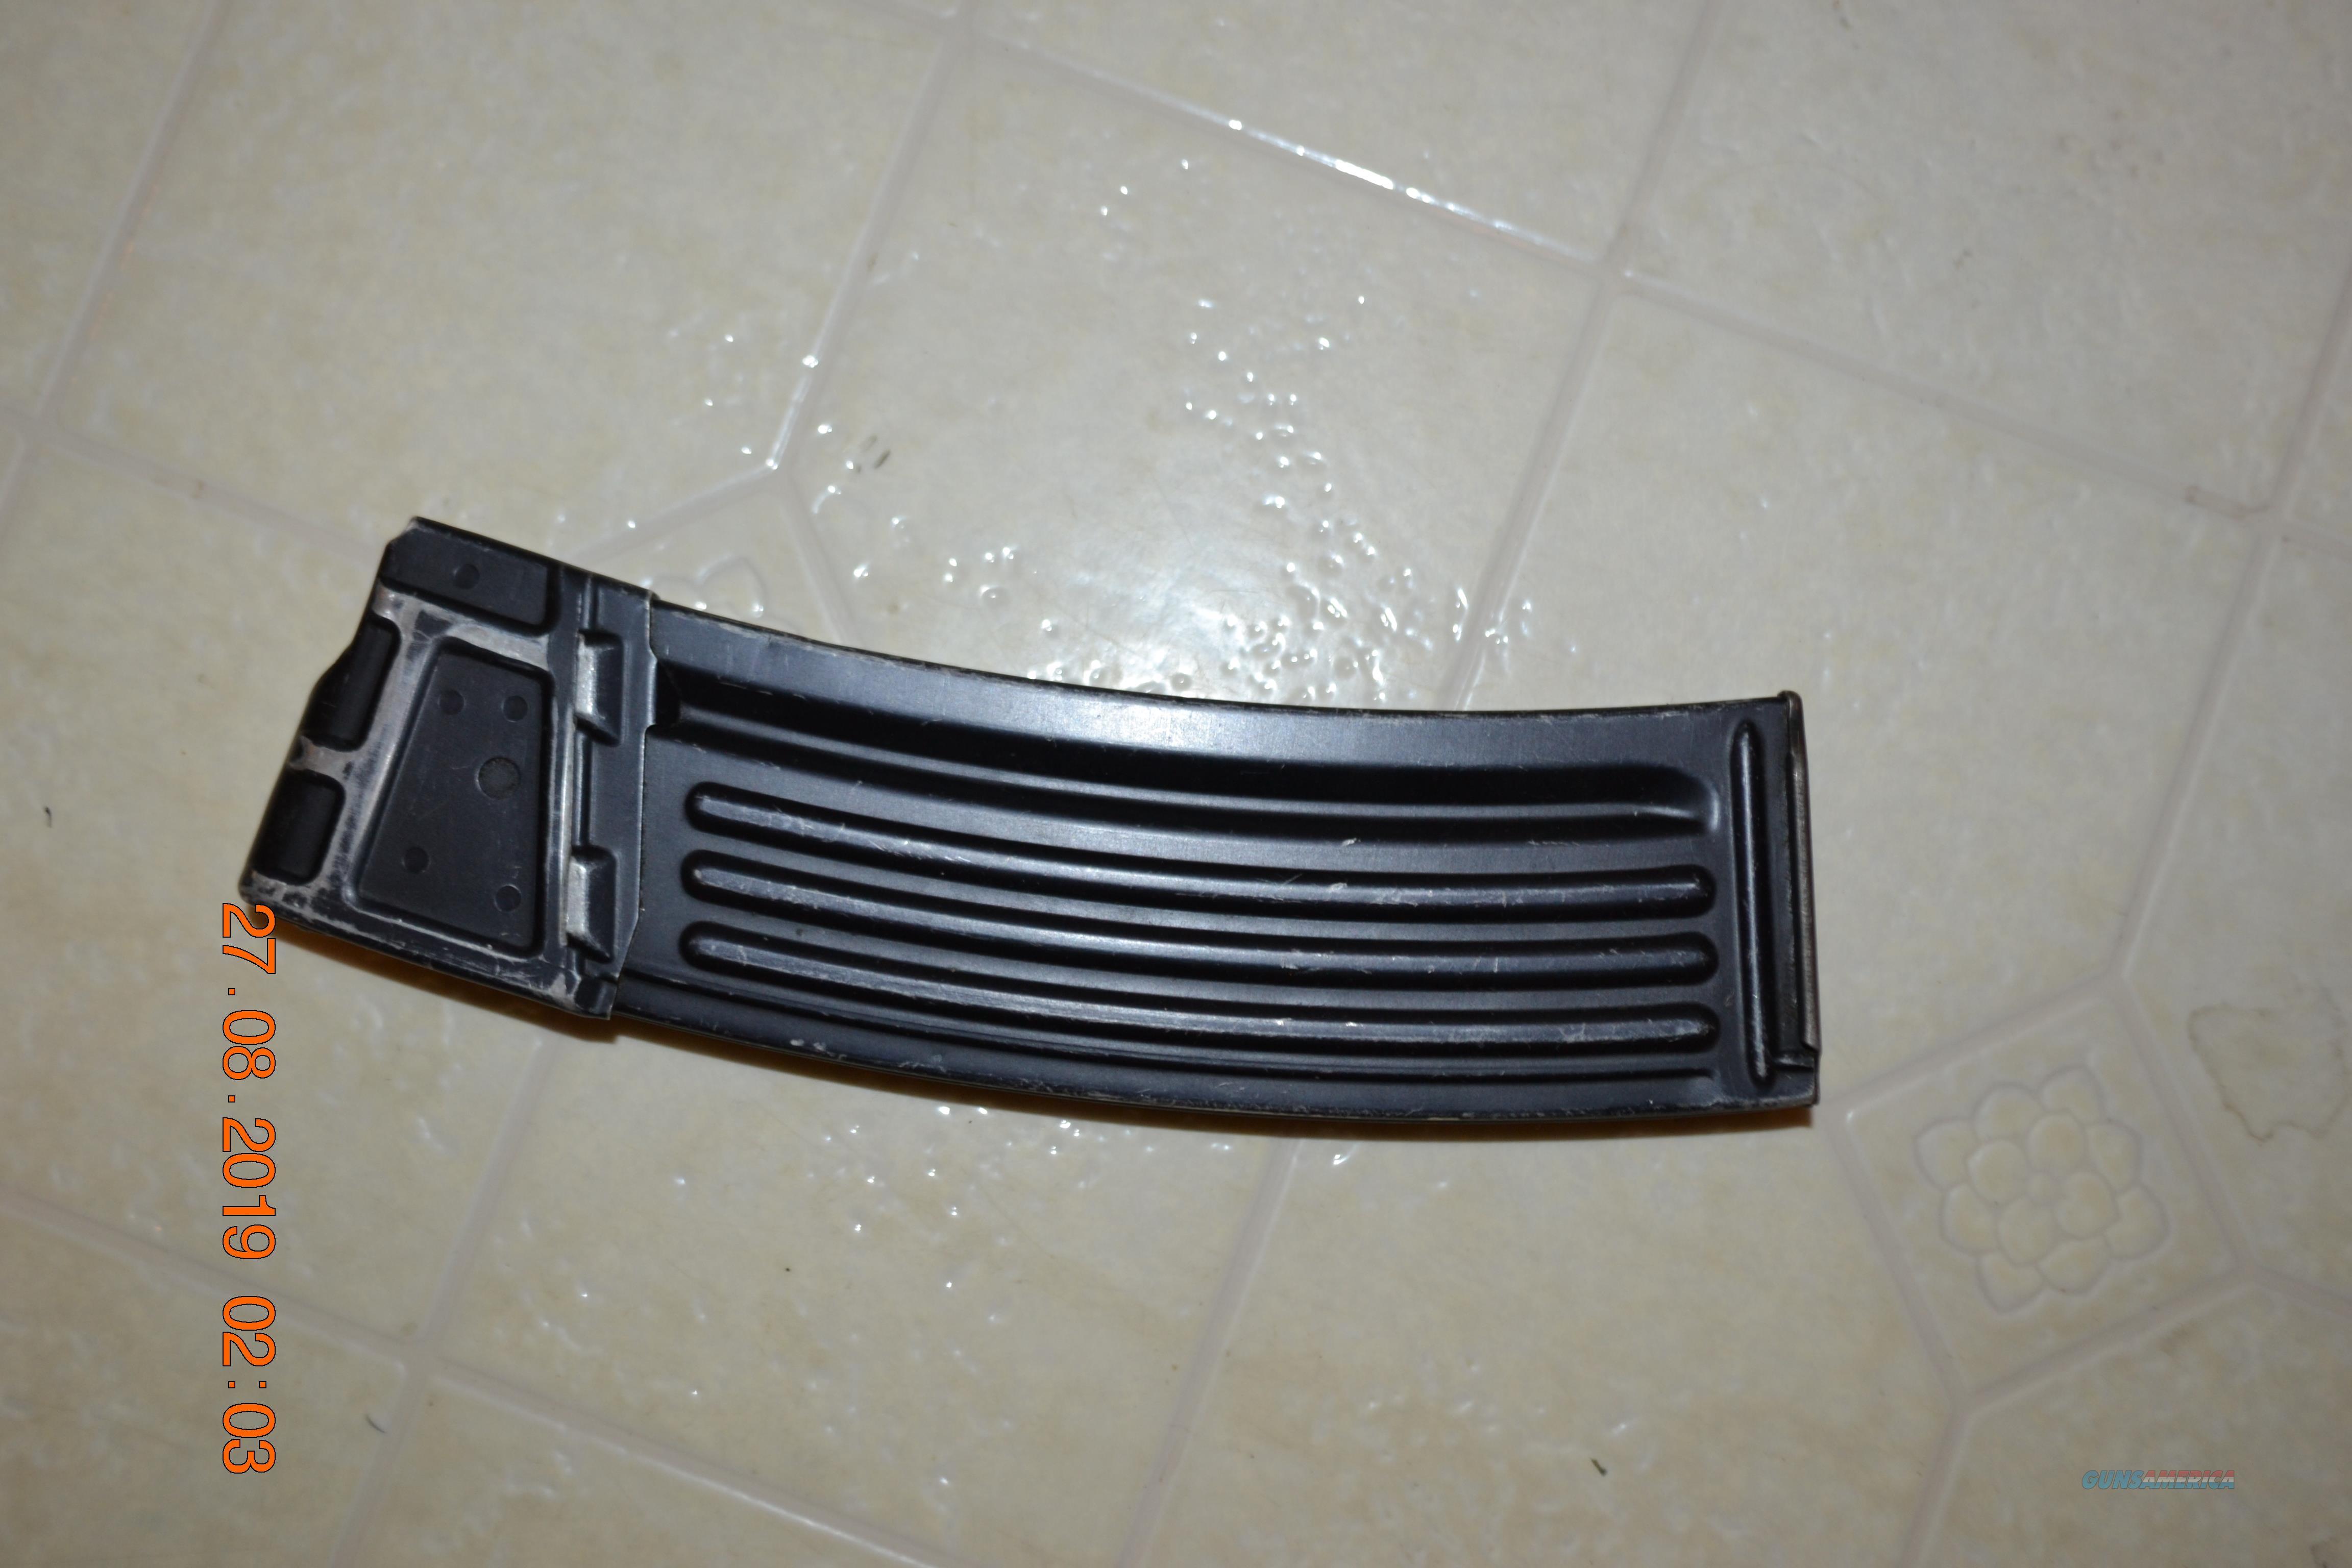 HK 33 .223 factory magazine  Non-Guns > Magazines & Clips > Rifle Magazines > Other